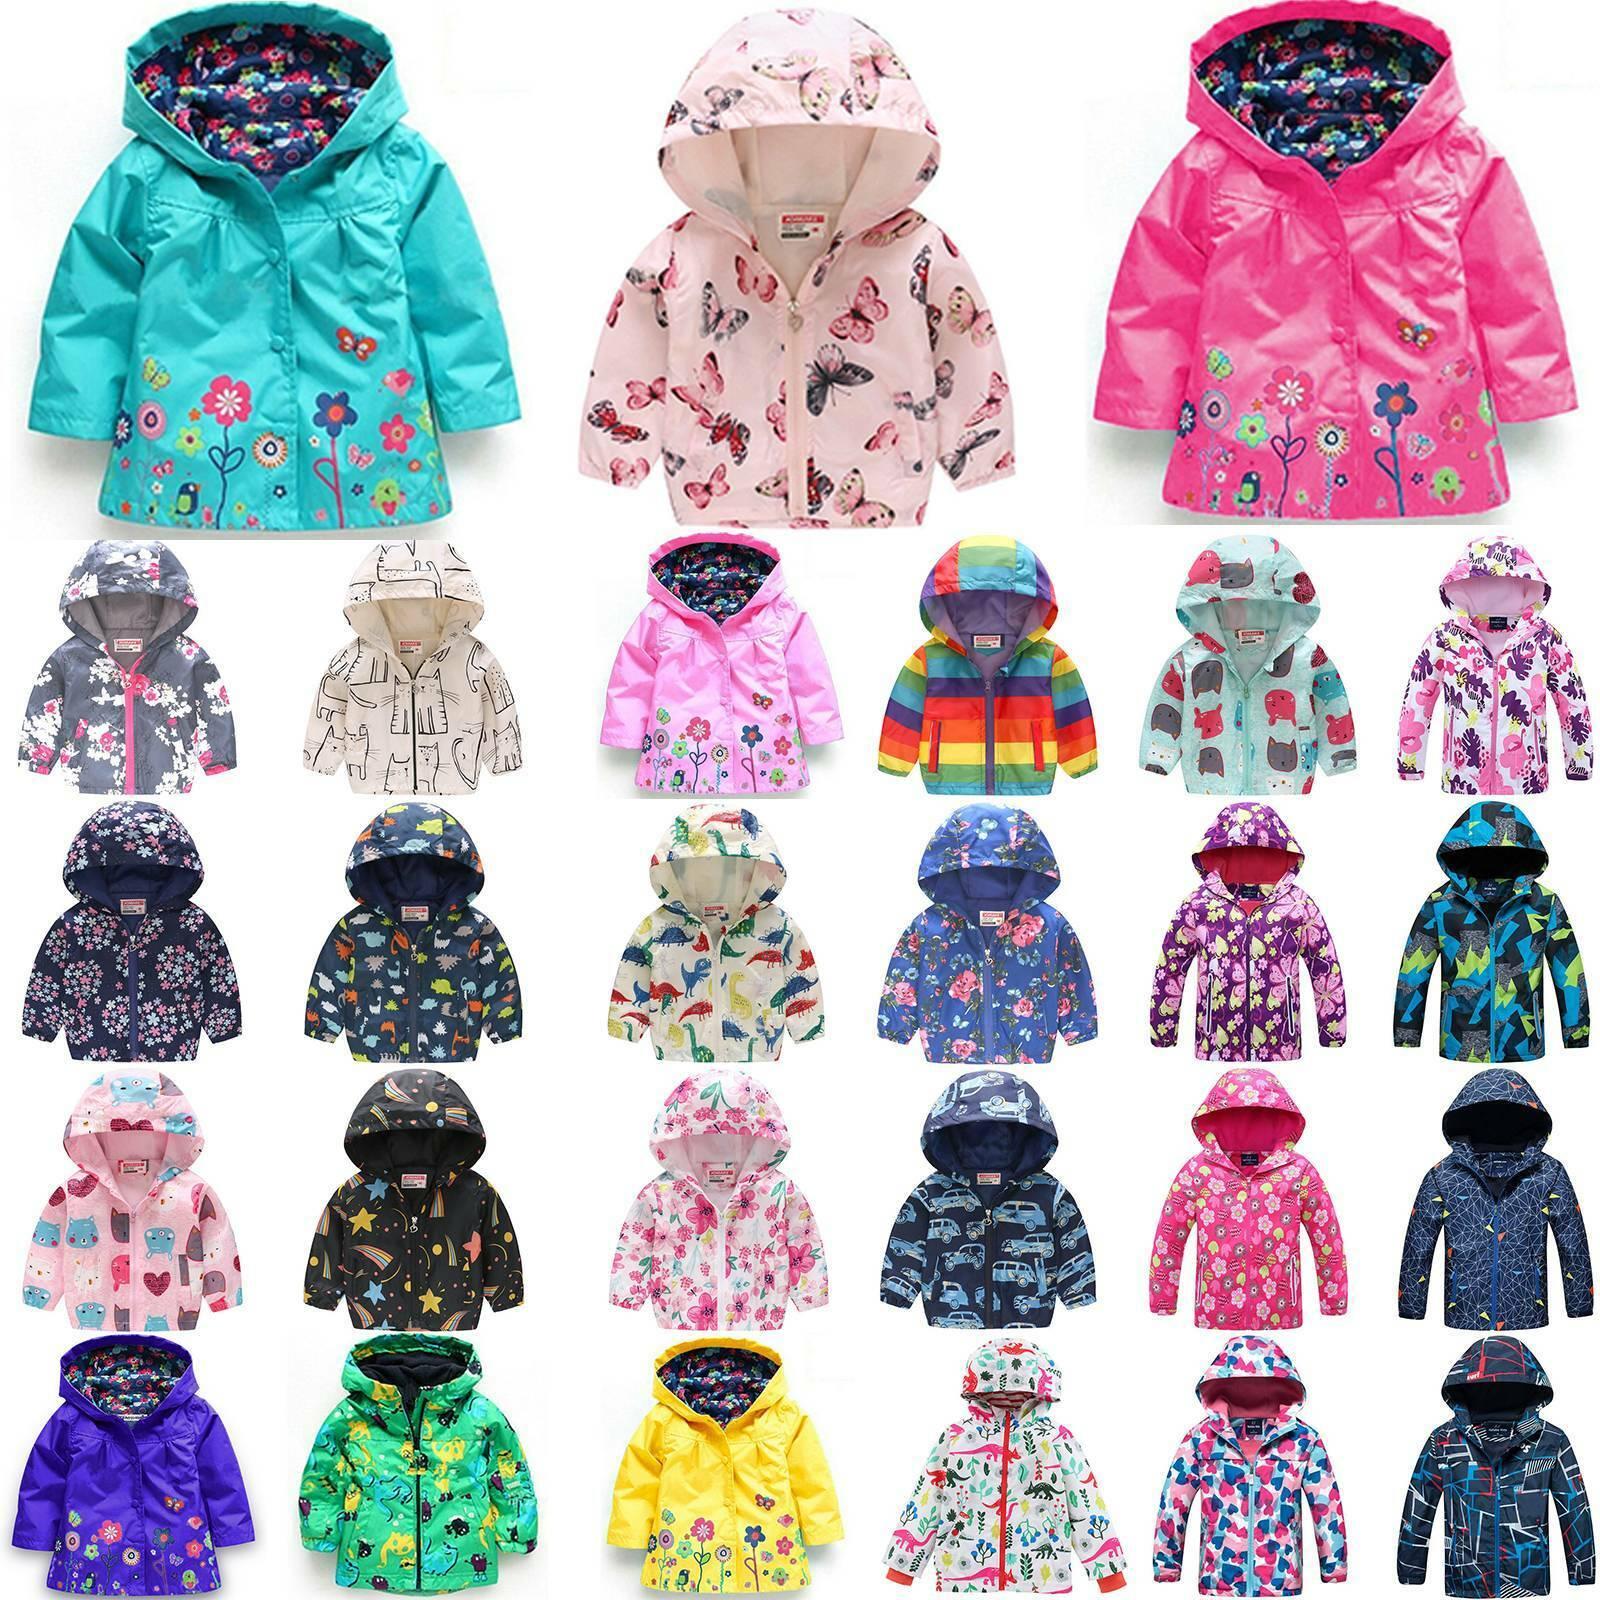 Fashion Kids Boys Waterproof Windproof Hooded Rain Coat Jacket Outerwear Clothes